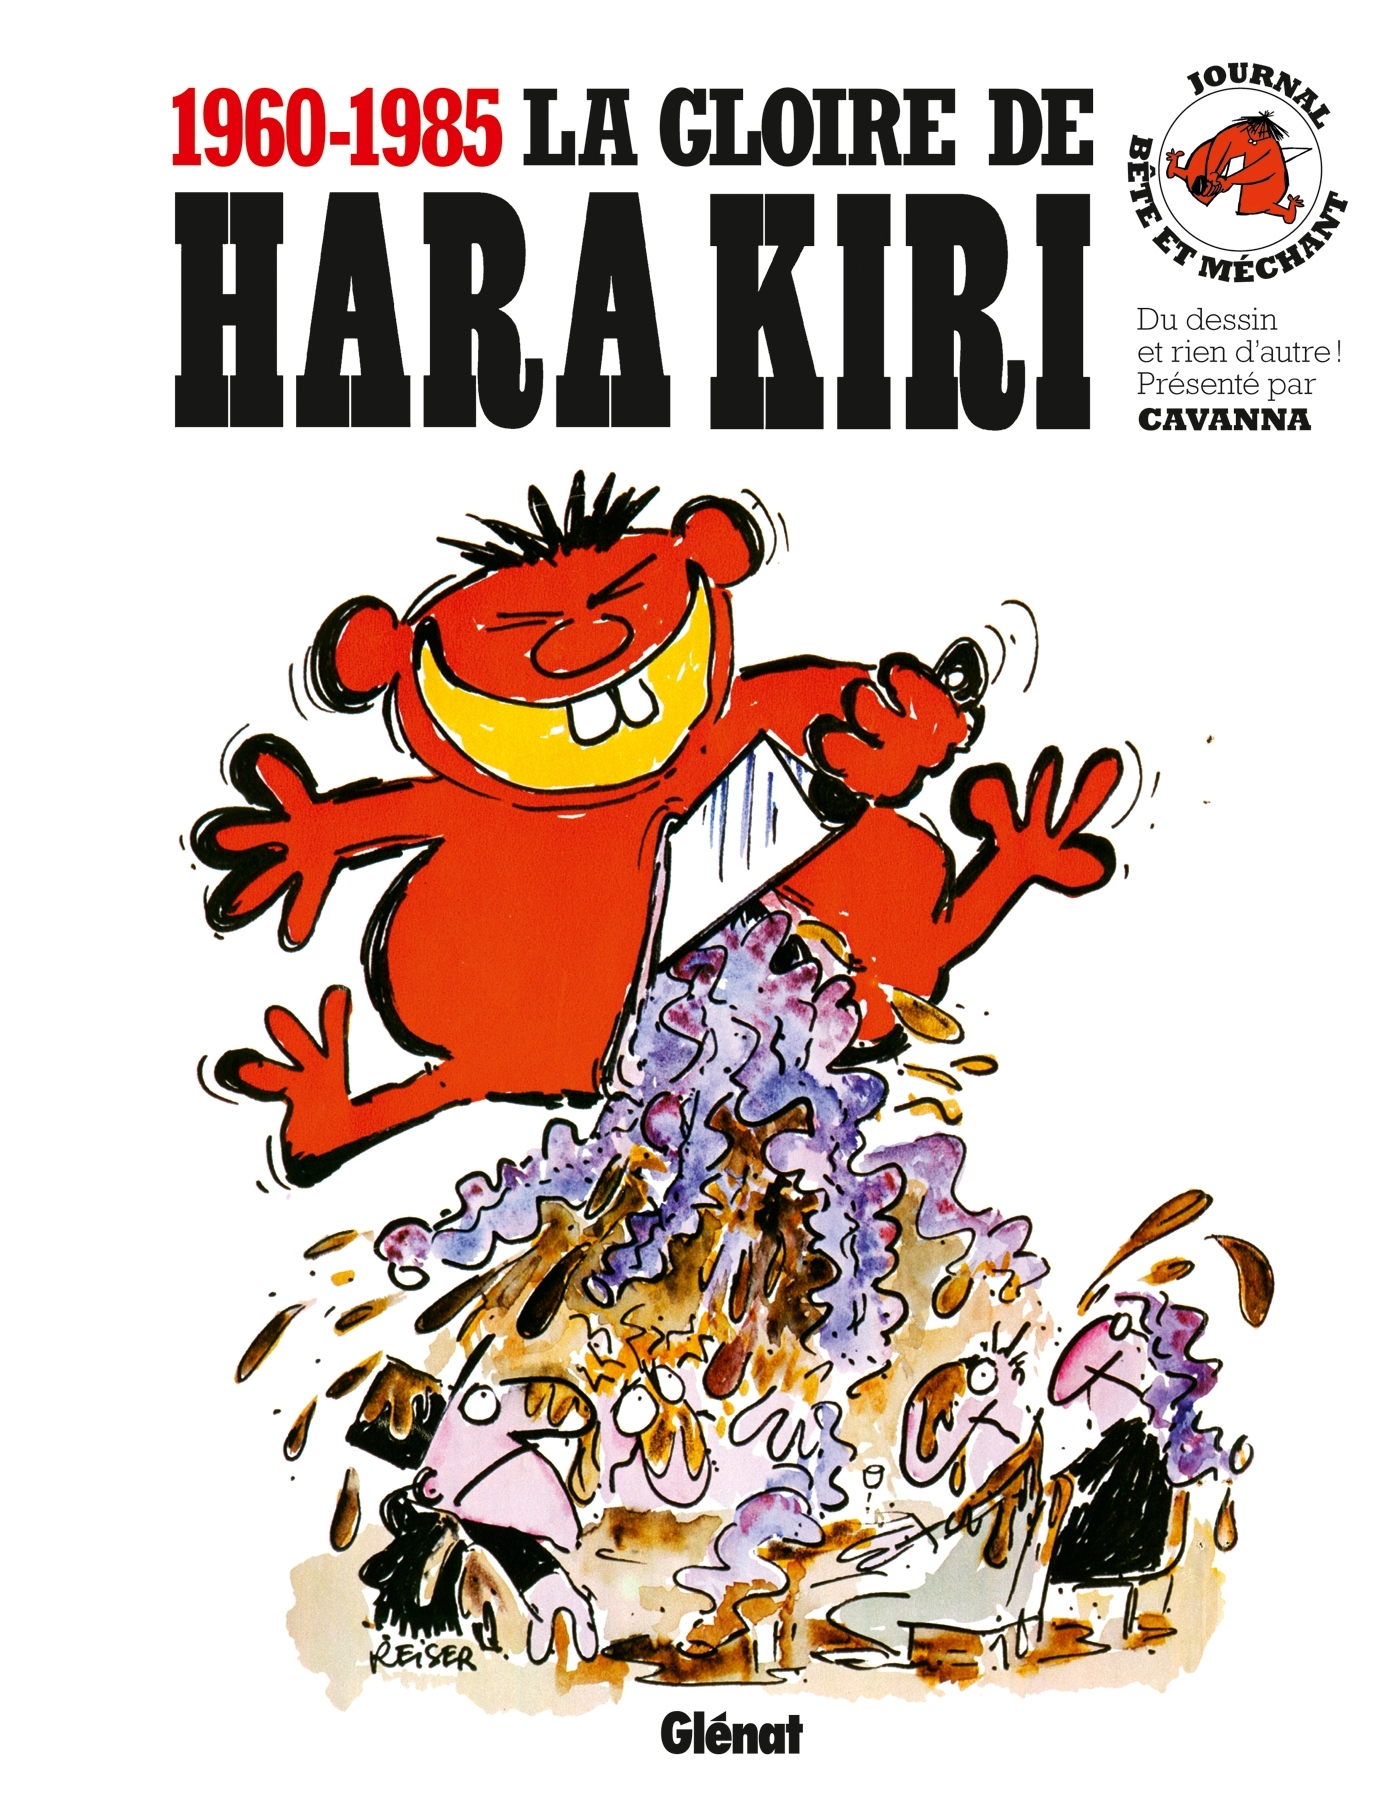 LA GLOIRE DE HARA KIRI - LES MEILLEURS DESSINS DE HARA KIRI